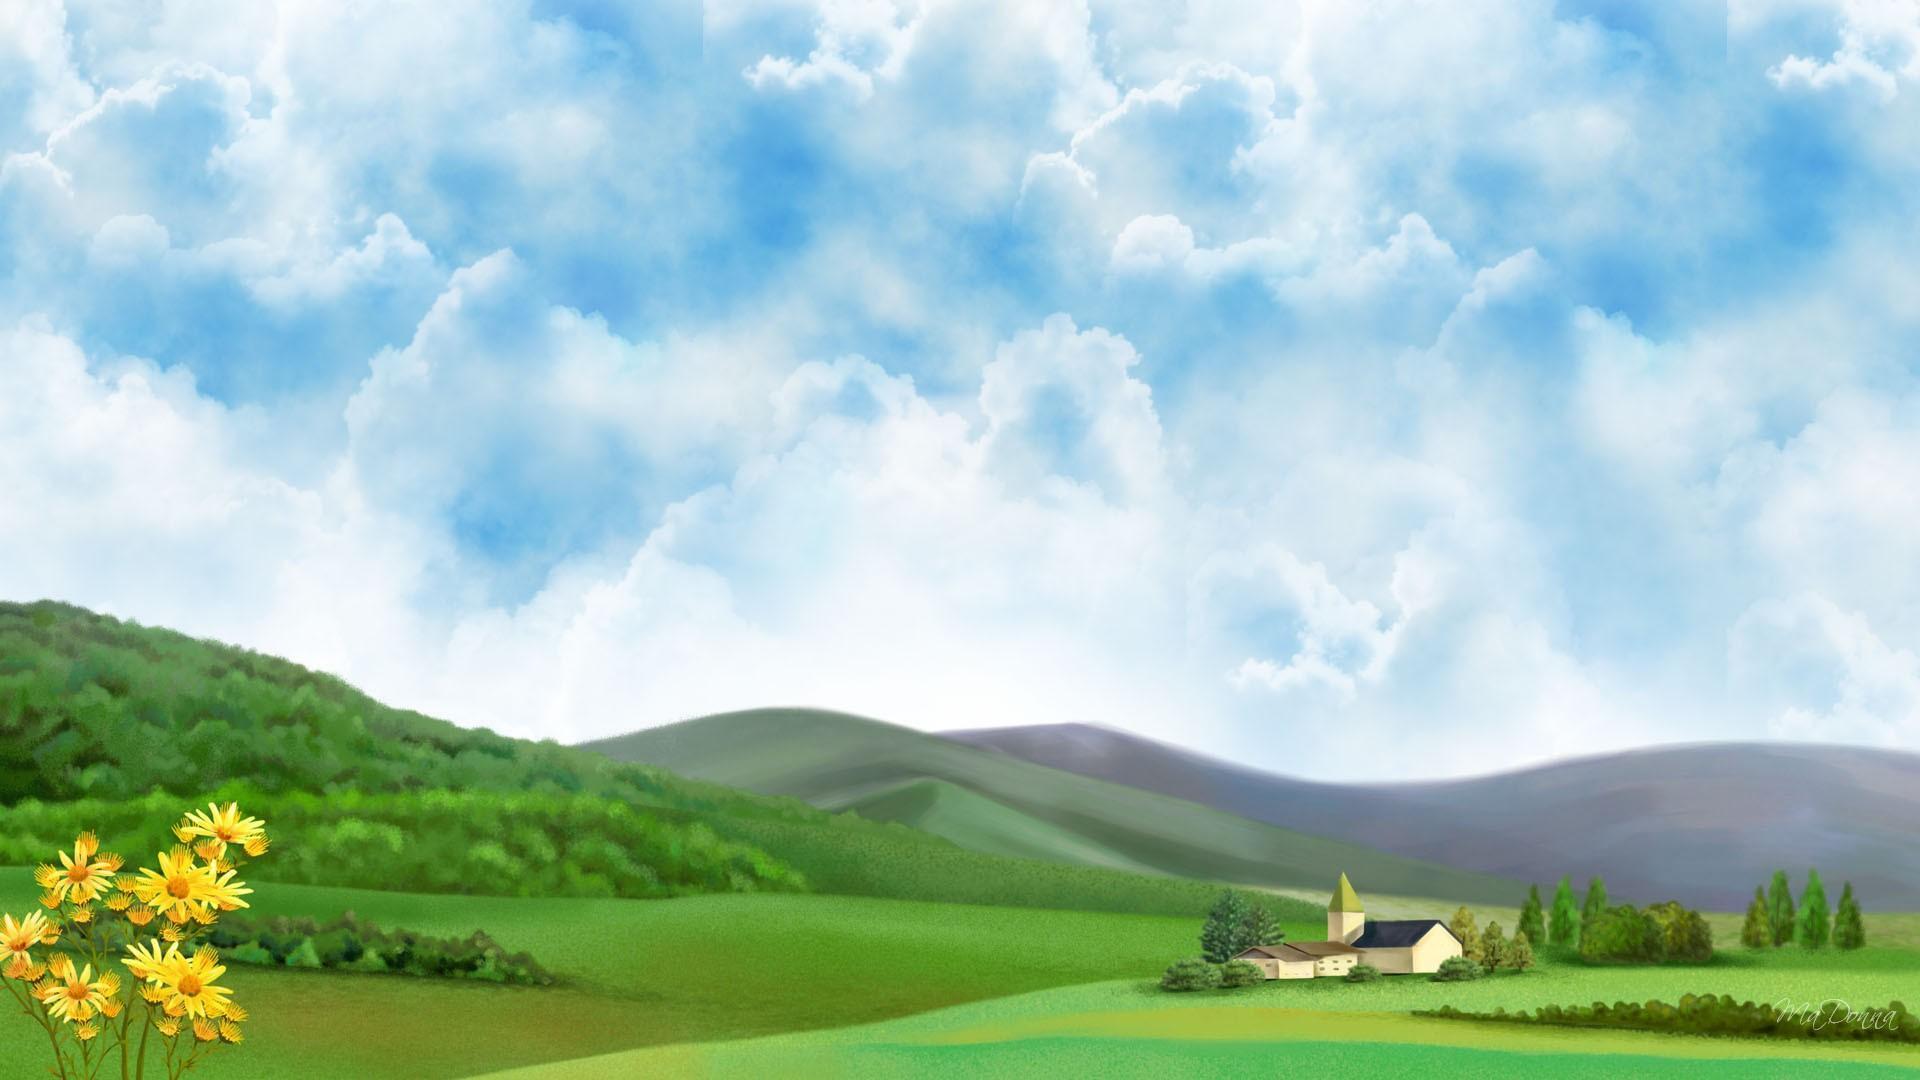 Farm Country HD desktop wallpaper Widescreen High 1920x1080